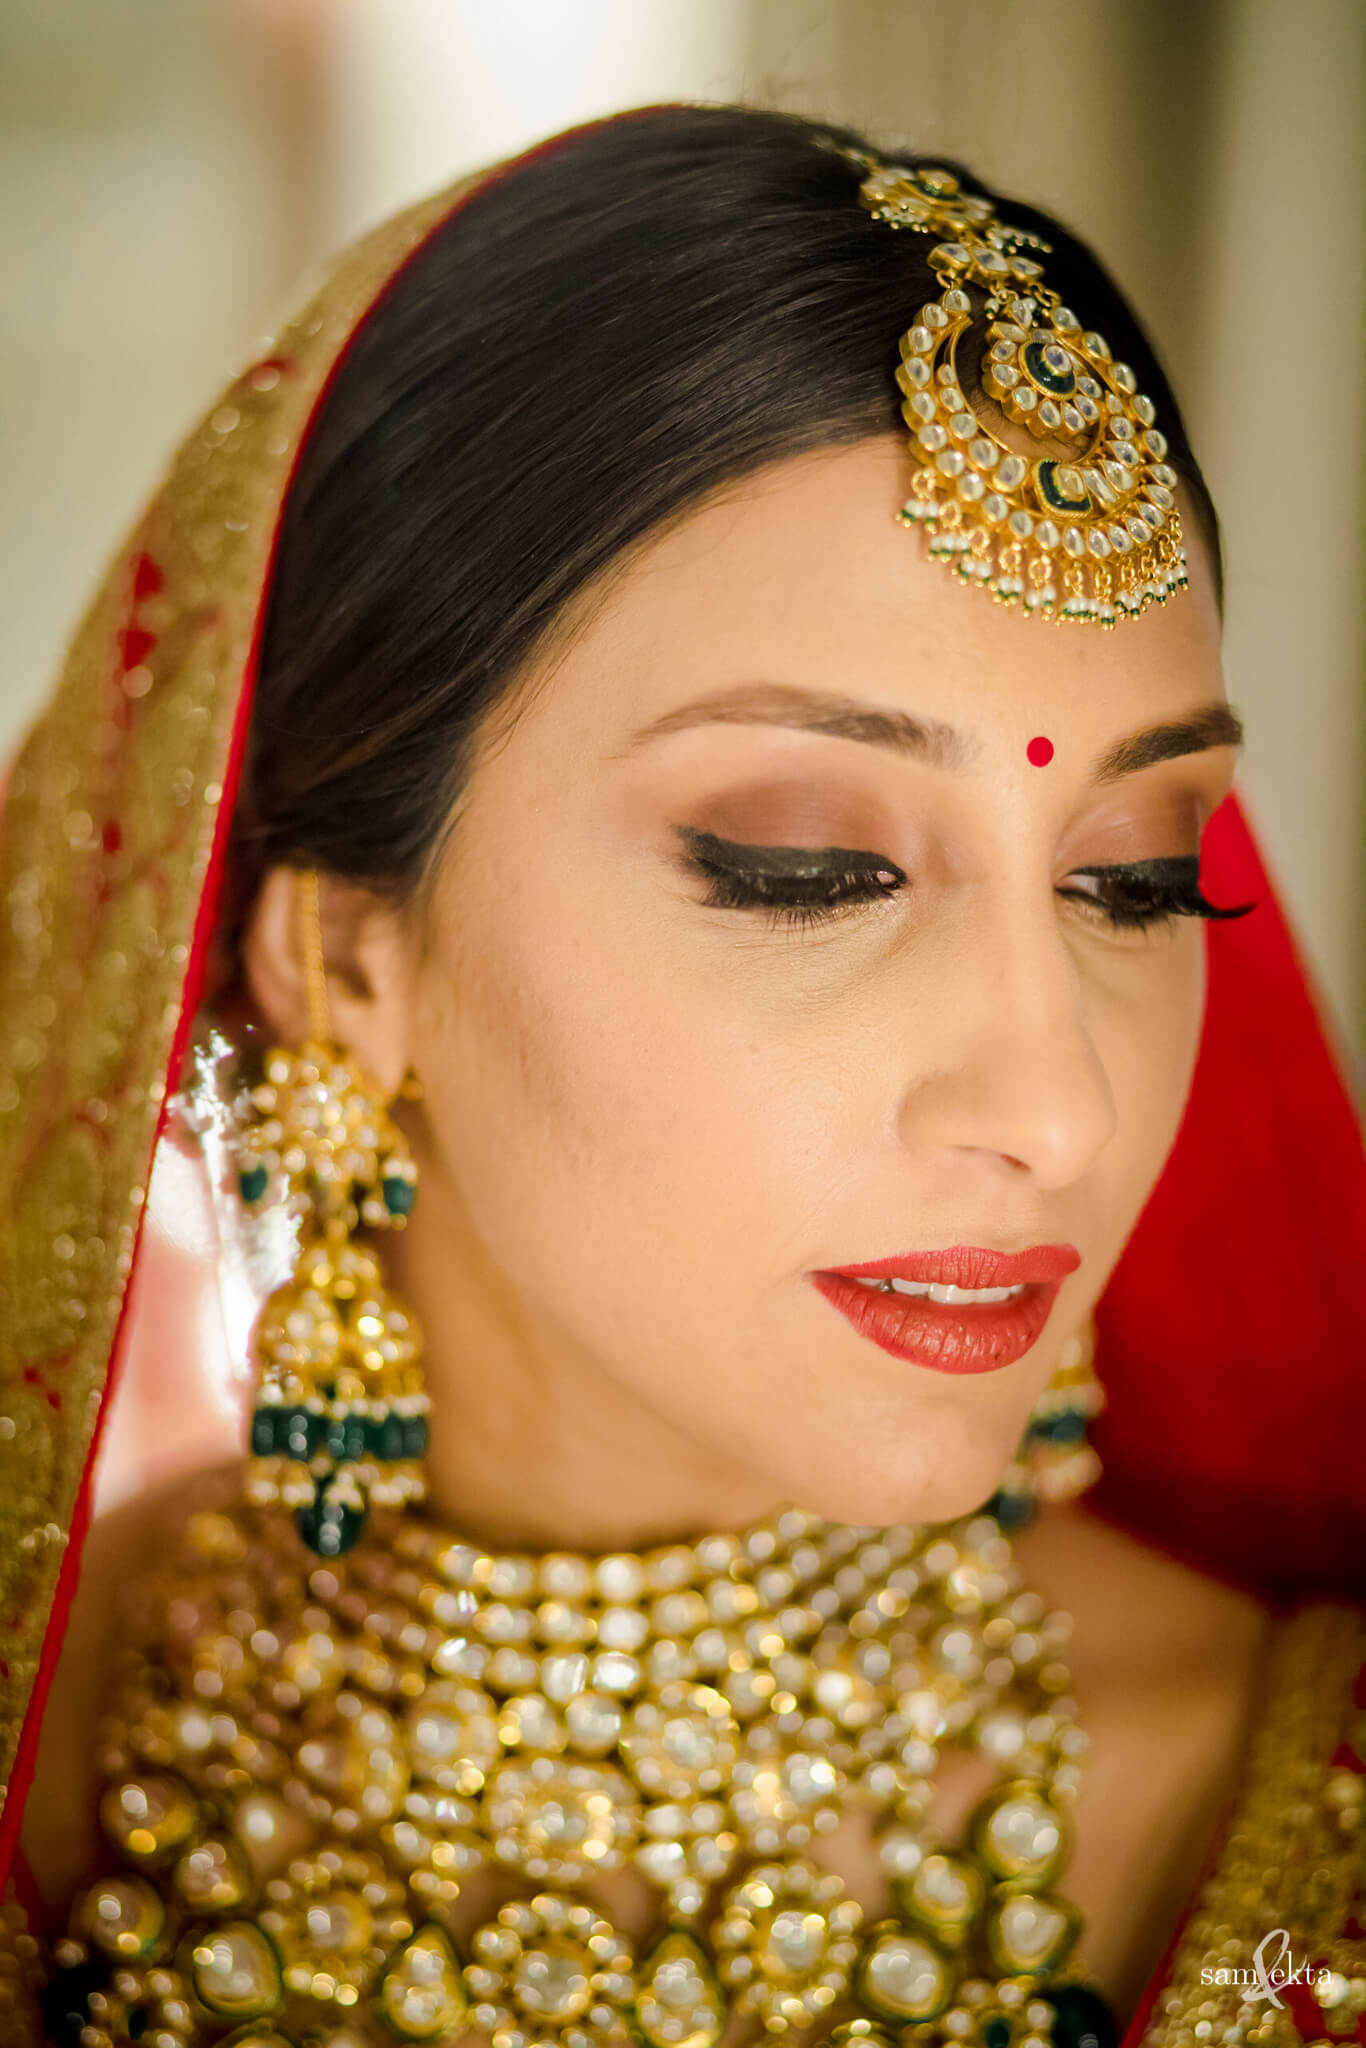 bridal makeup, Armaan Jain And Anissa Malhotra's Wedding